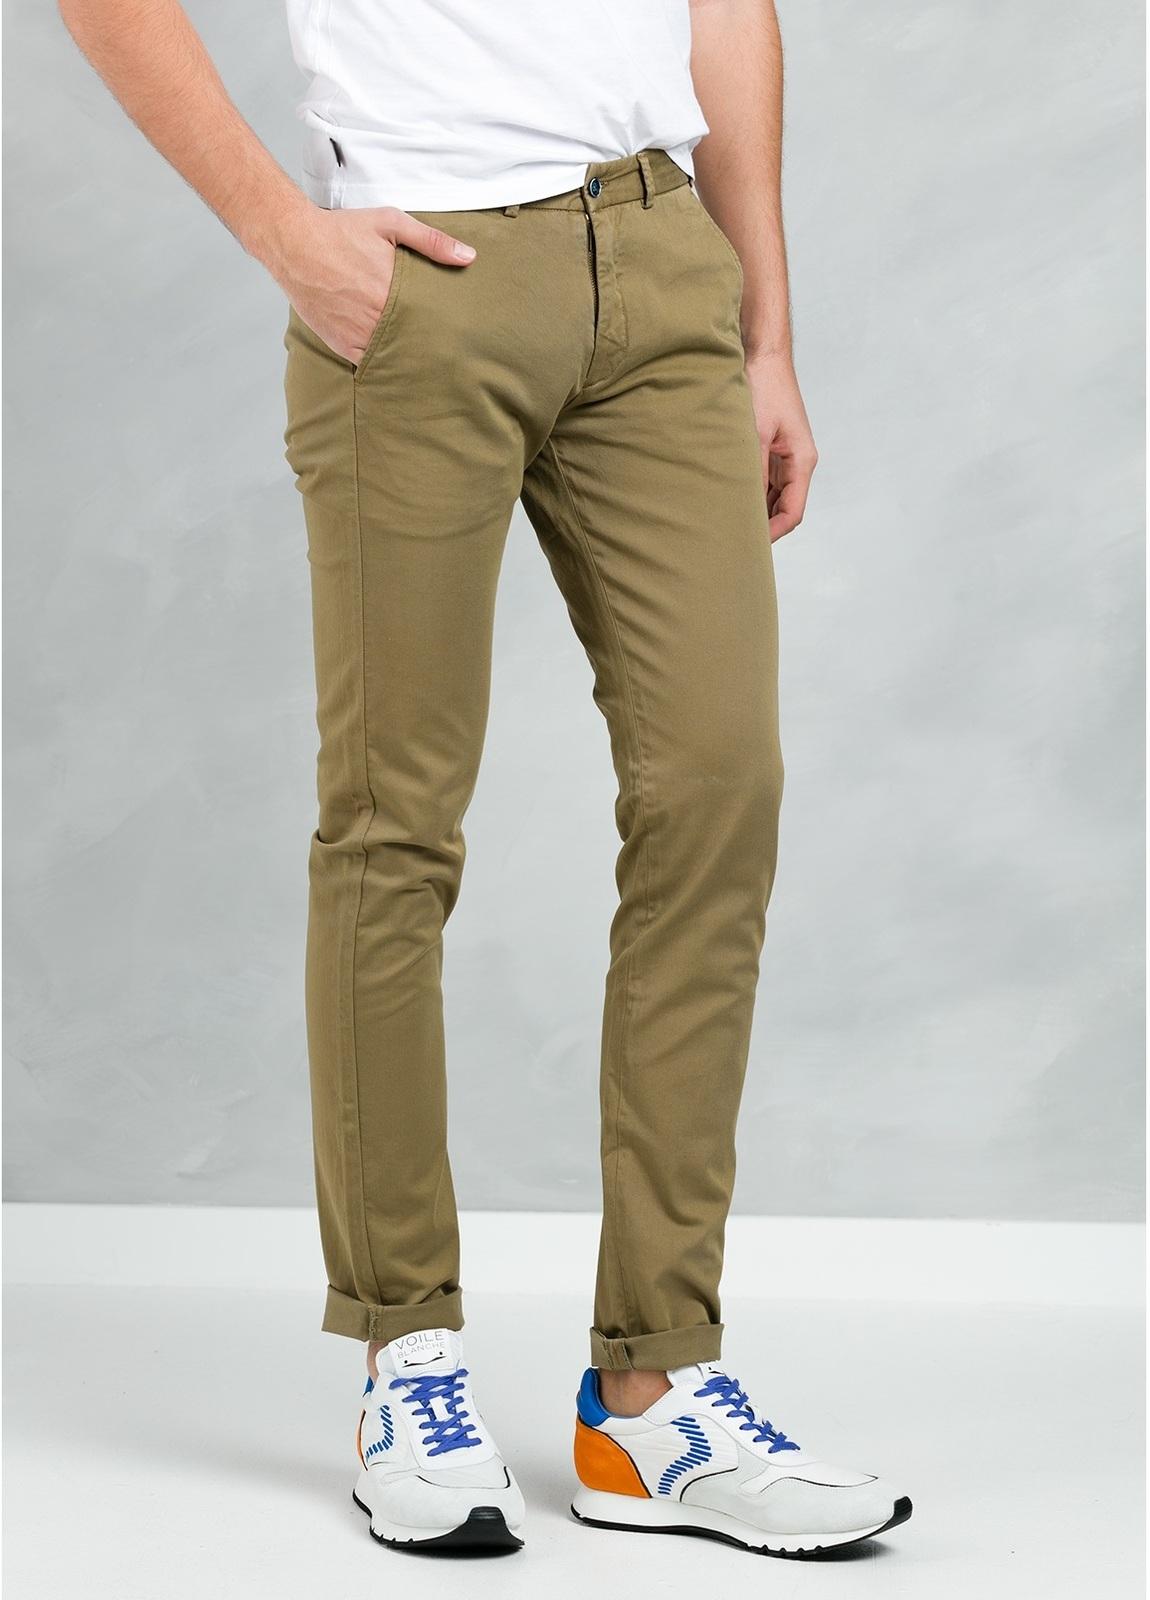 Pantalón Casual Wear, SLIM FIT micro textura color tostado, 97% Algodón 3% Elastómero. - Ítem2